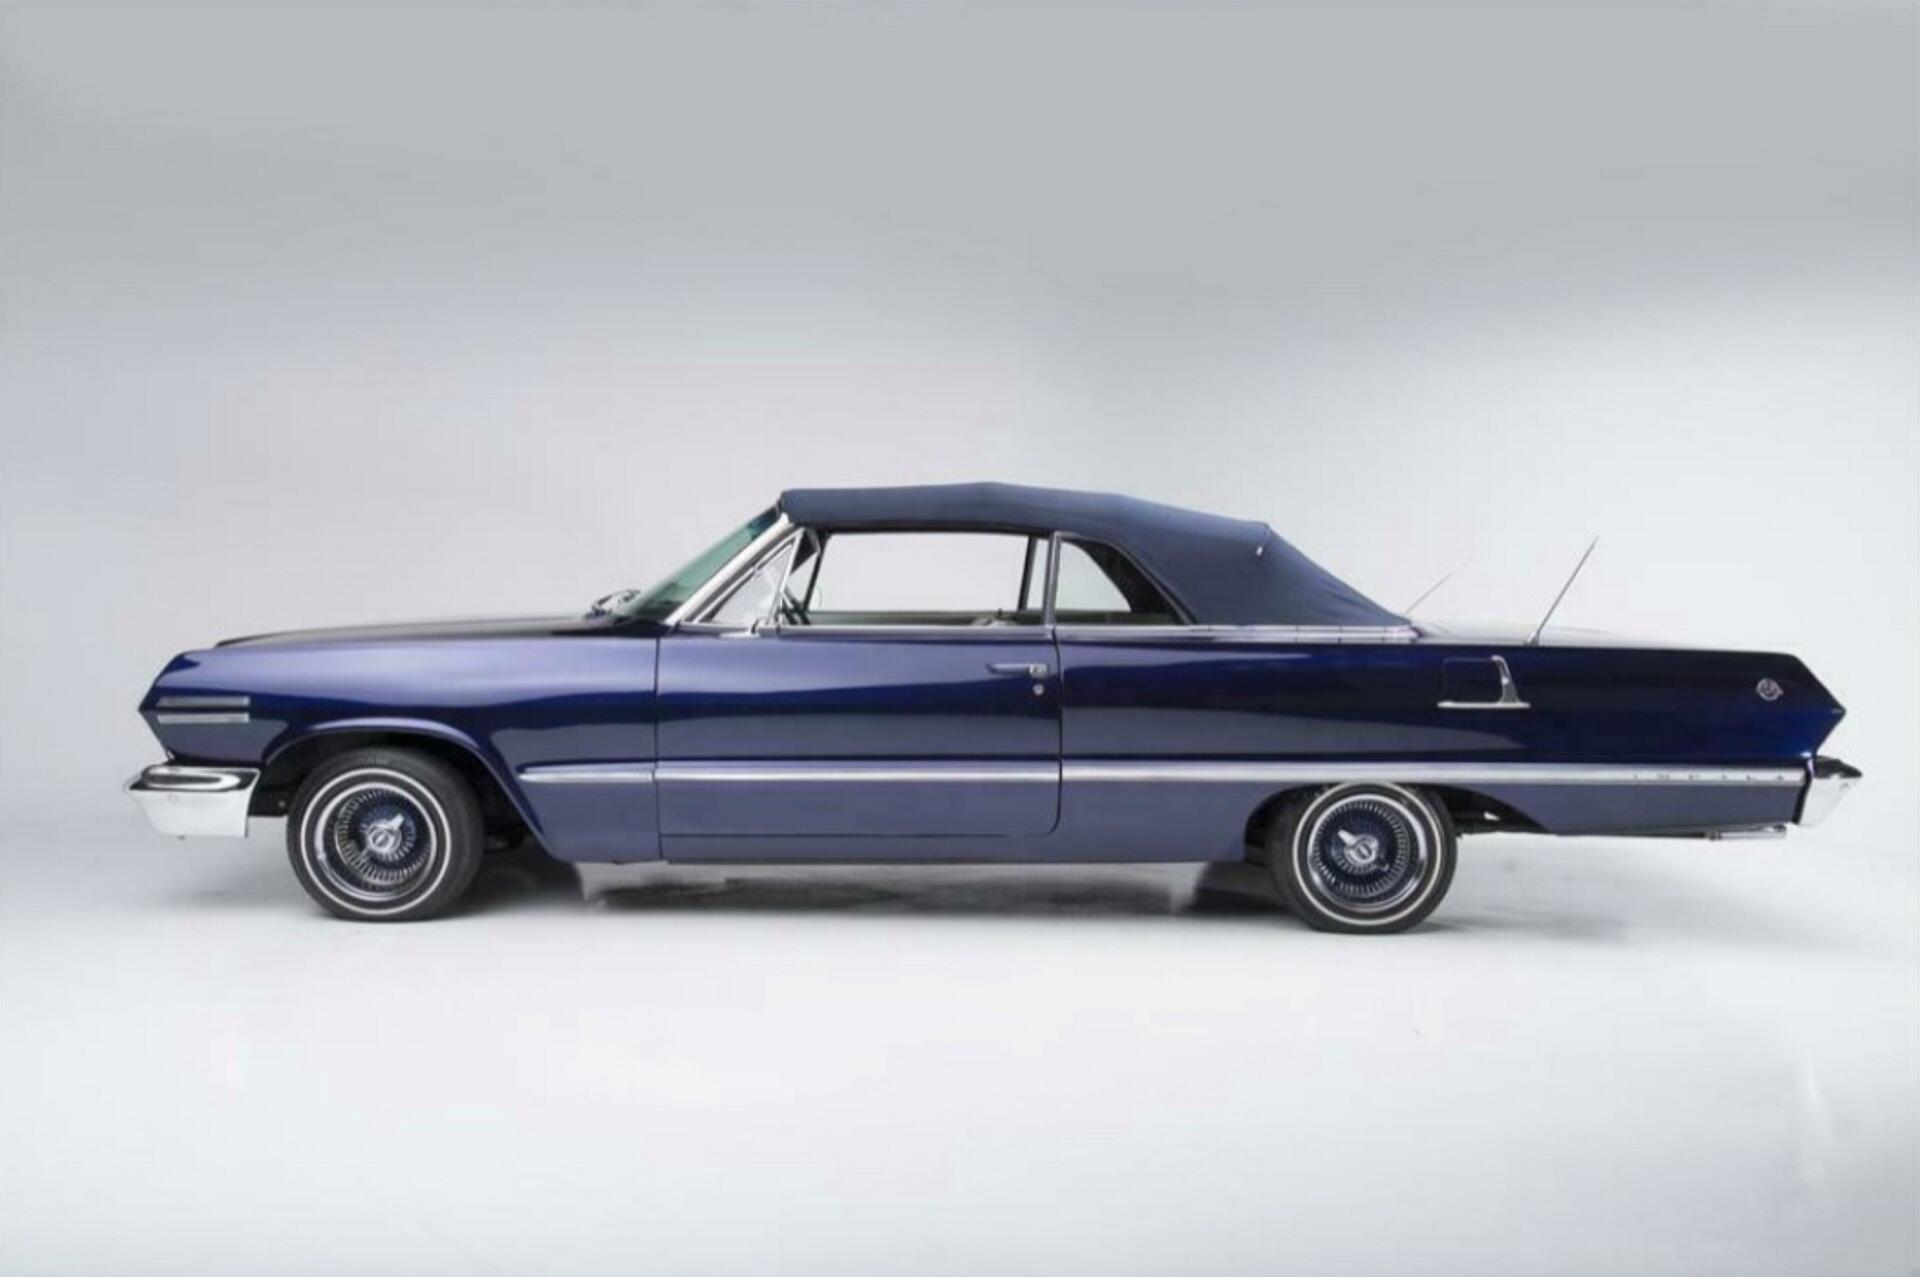 chiec-chevorlet-impala-1963-cua-kobe-bryant-duoc-ban-dau-gia